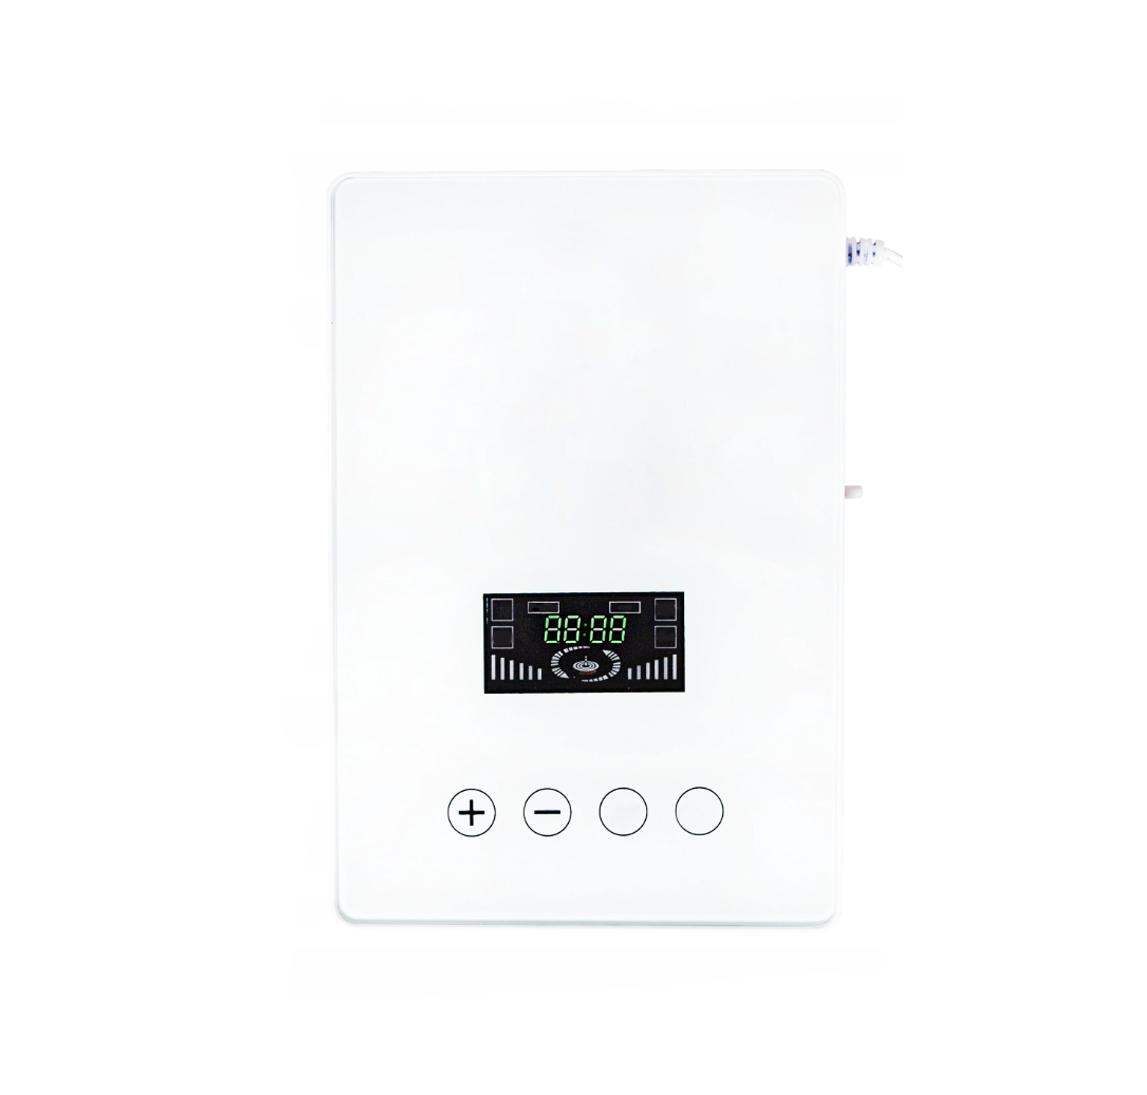 Malatec 10700 Generátor ozónu 600 mg / h biely